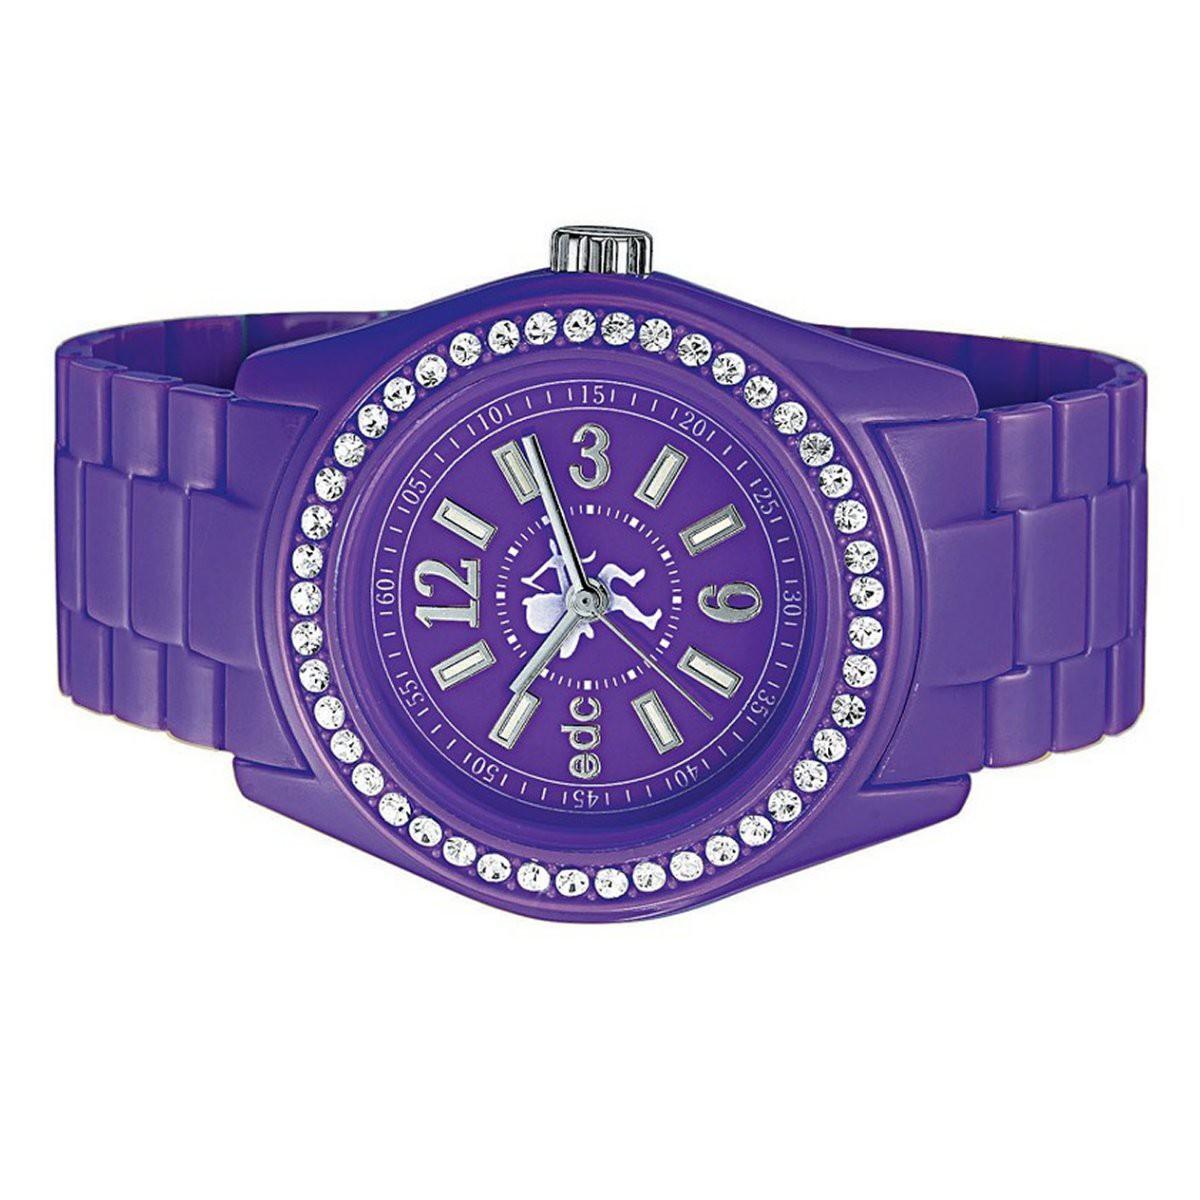 edc by esprit uhr armbanduhr damen discoglam crazy purple ee900172005. Black Bedroom Furniture Sets. Home Design Ideas